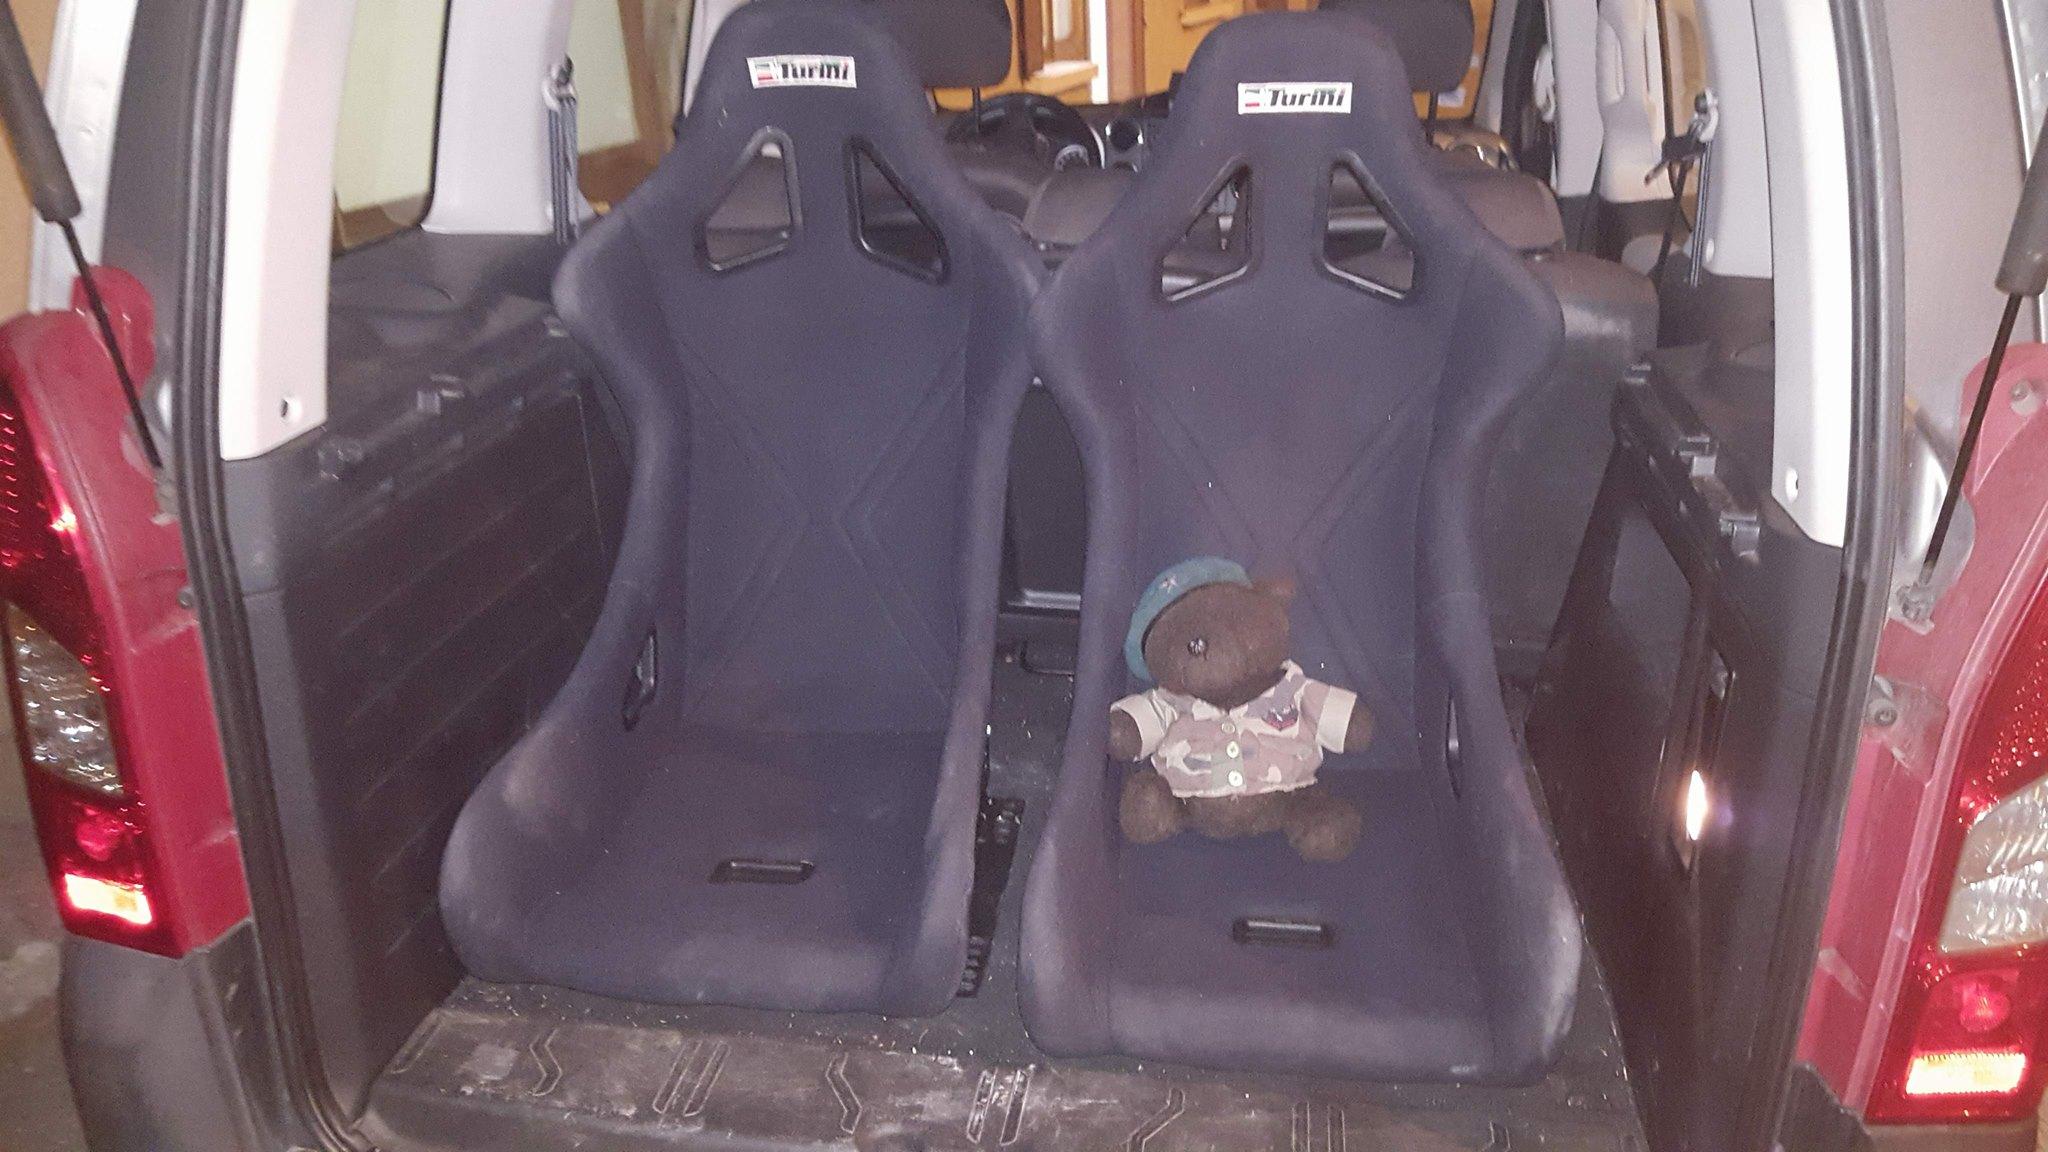 projet remontage buggy super GP 74  6523262237537210155256483889139762913949o